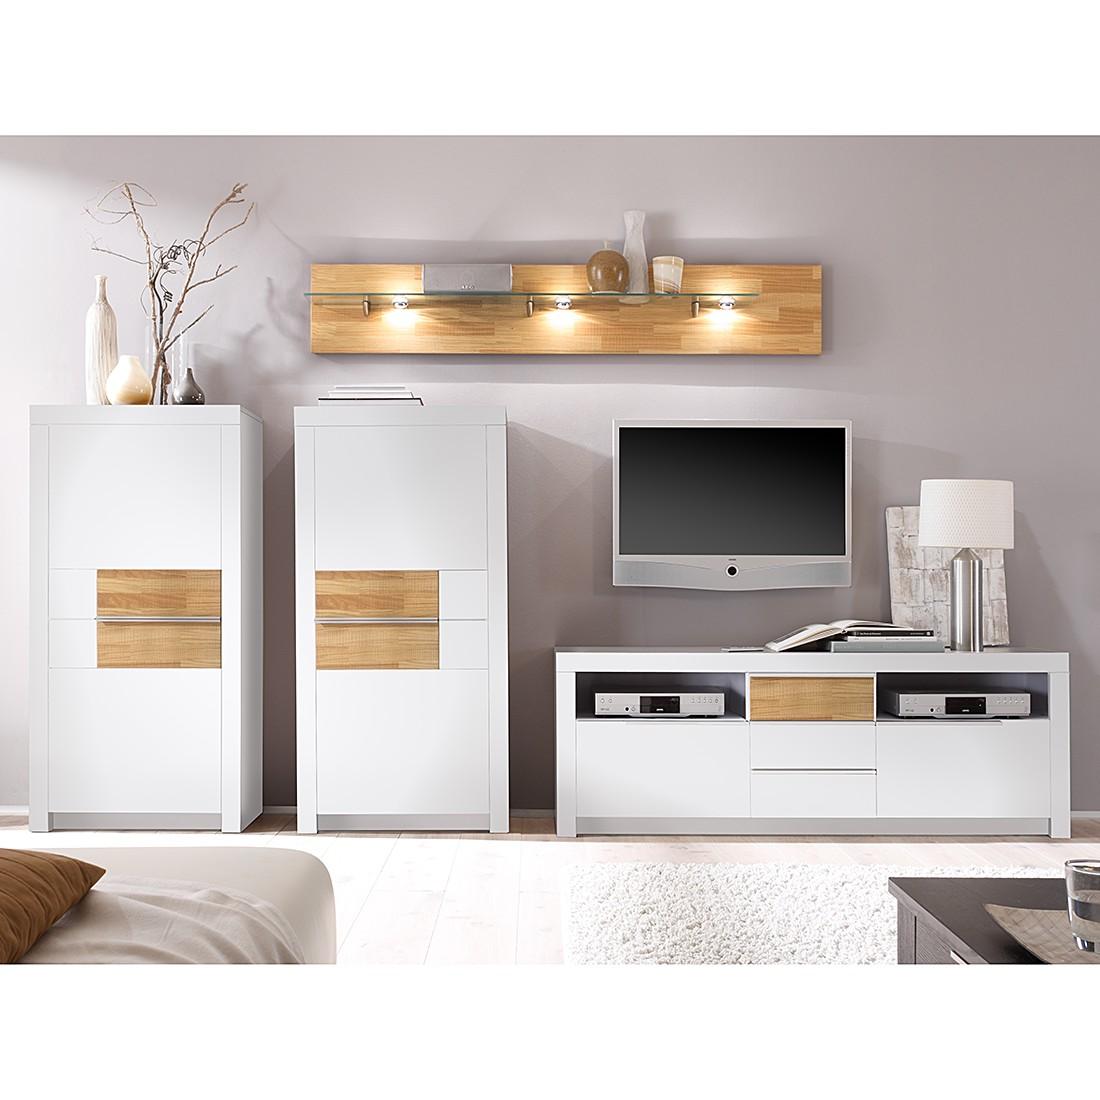 wohnwand oregon 4 teilig kernbuche massiv ge lt gewachst wohnwand 4 teilig ohne. Black Bedroom Furniture Sets. Home Design Ideas